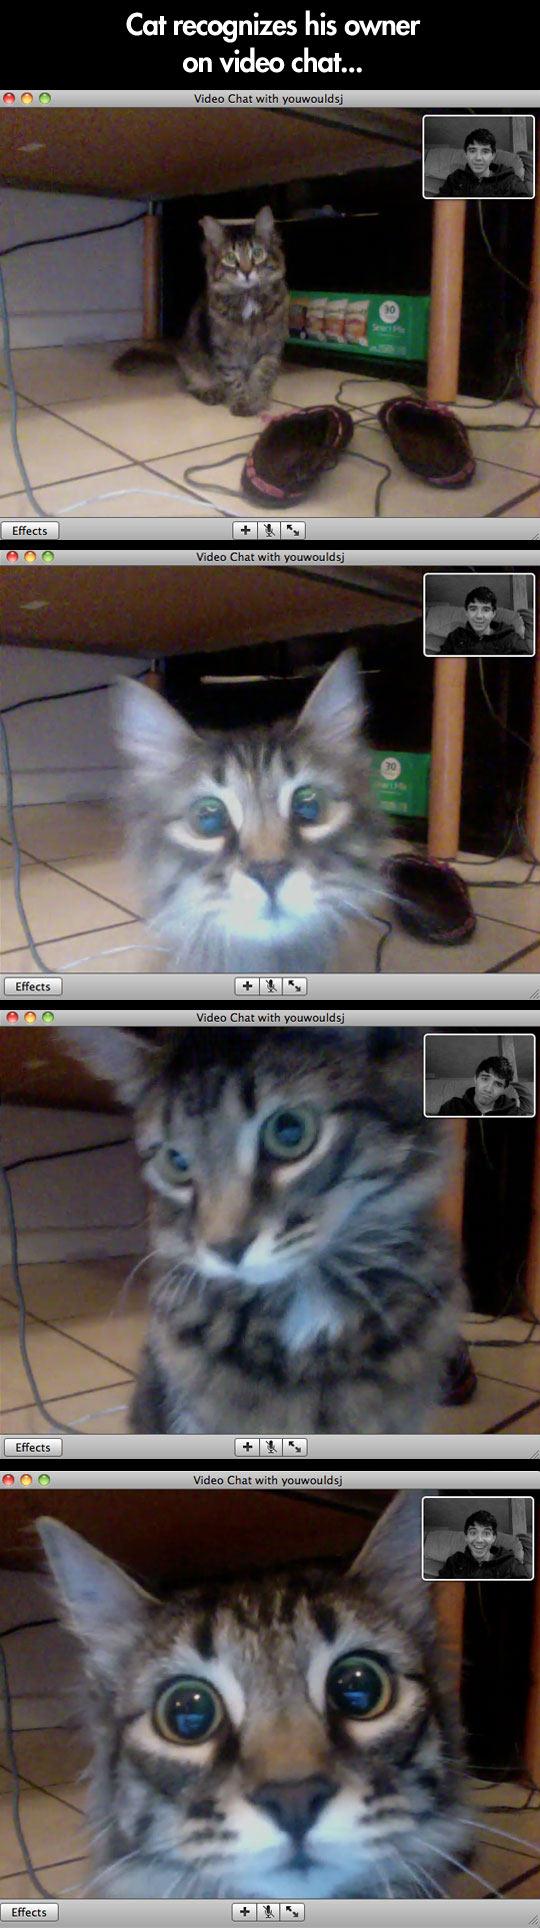 cool-cat-screen-video-call-owner